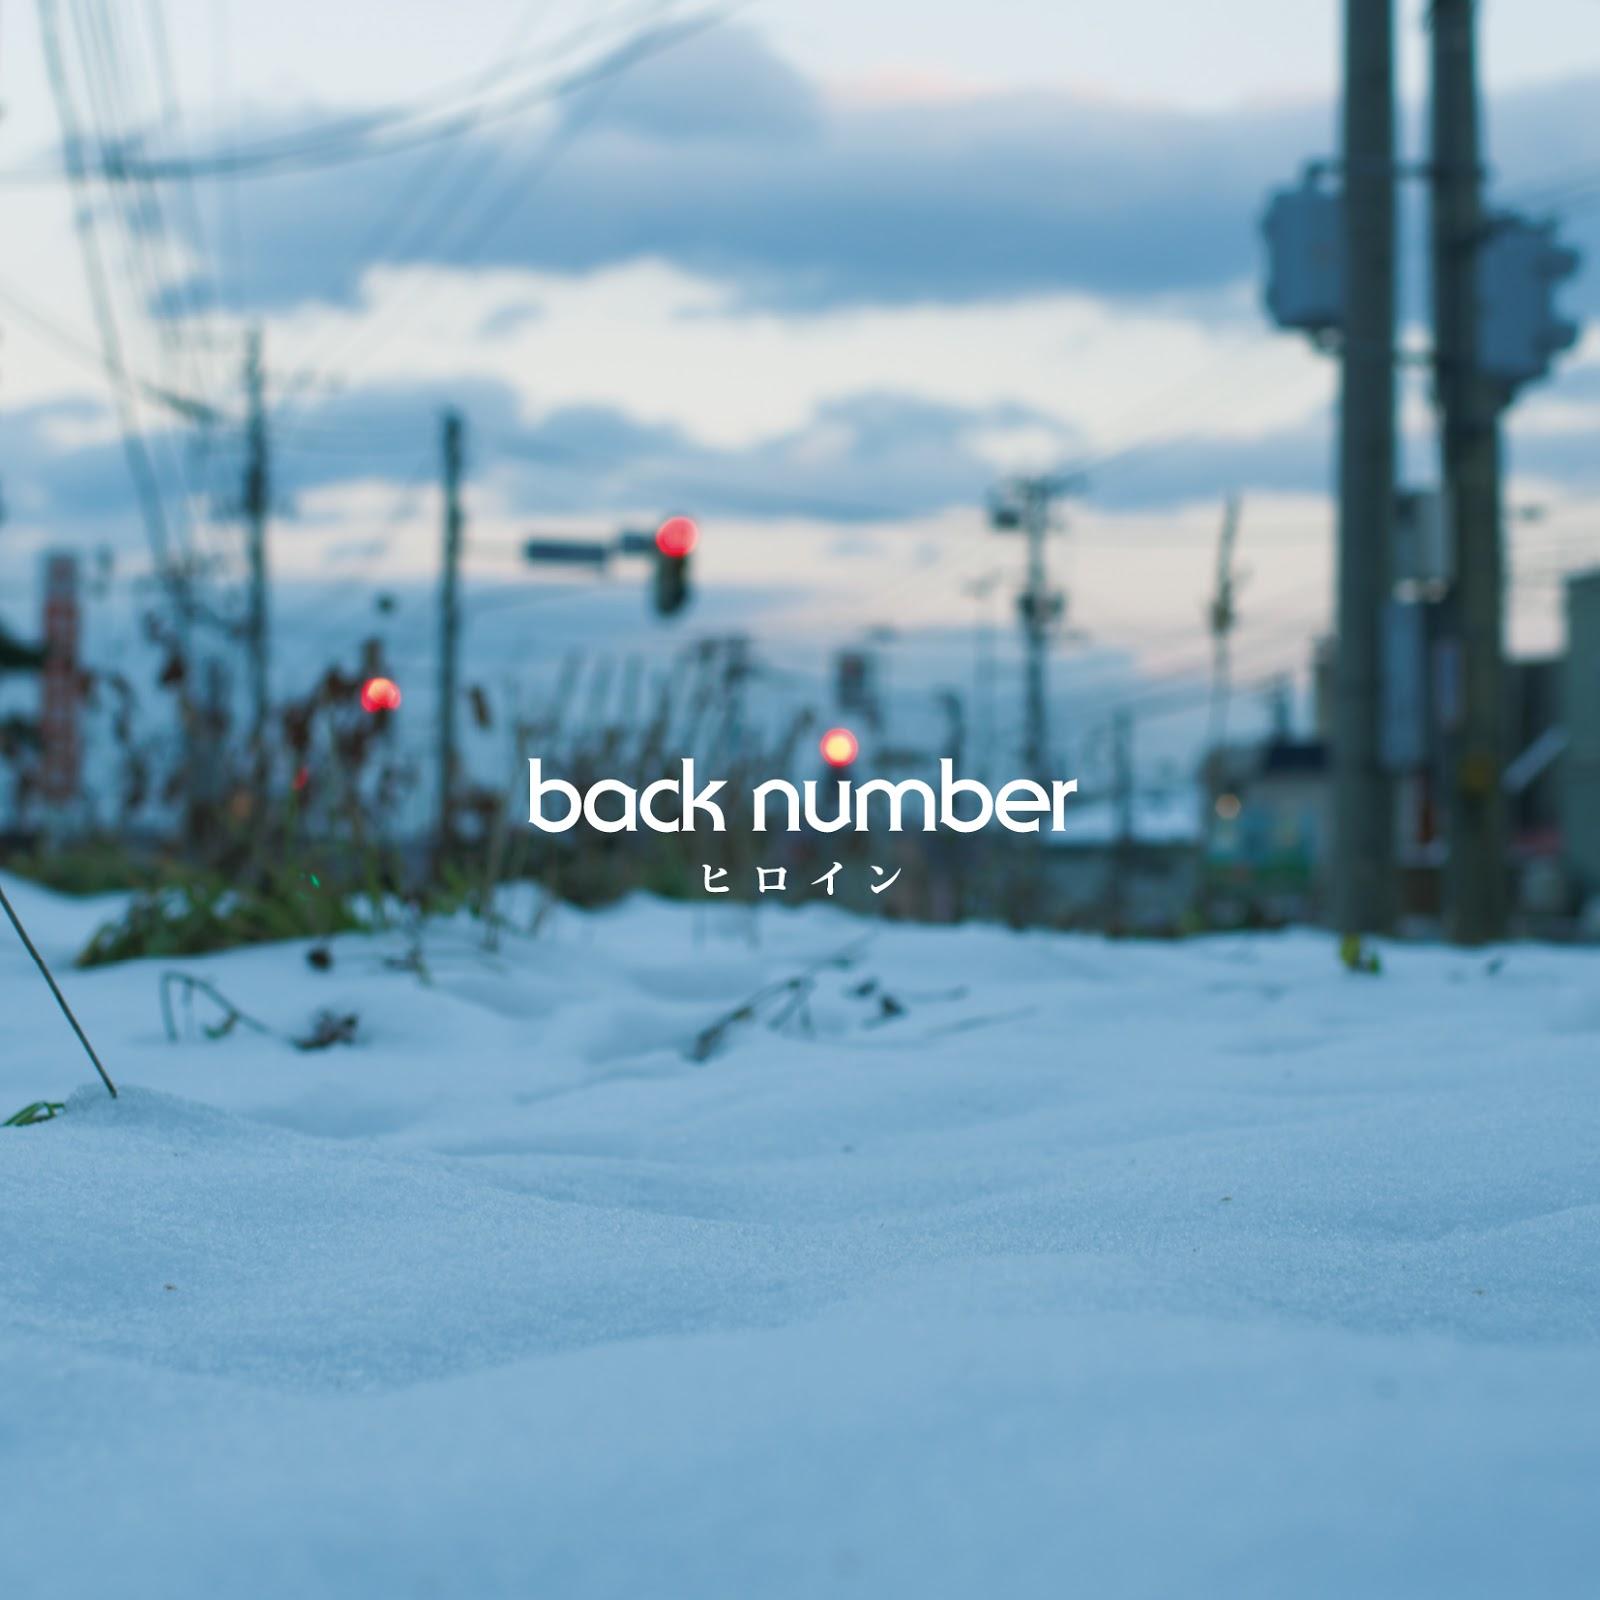 [Single] ヒロイン / Heroine - back number